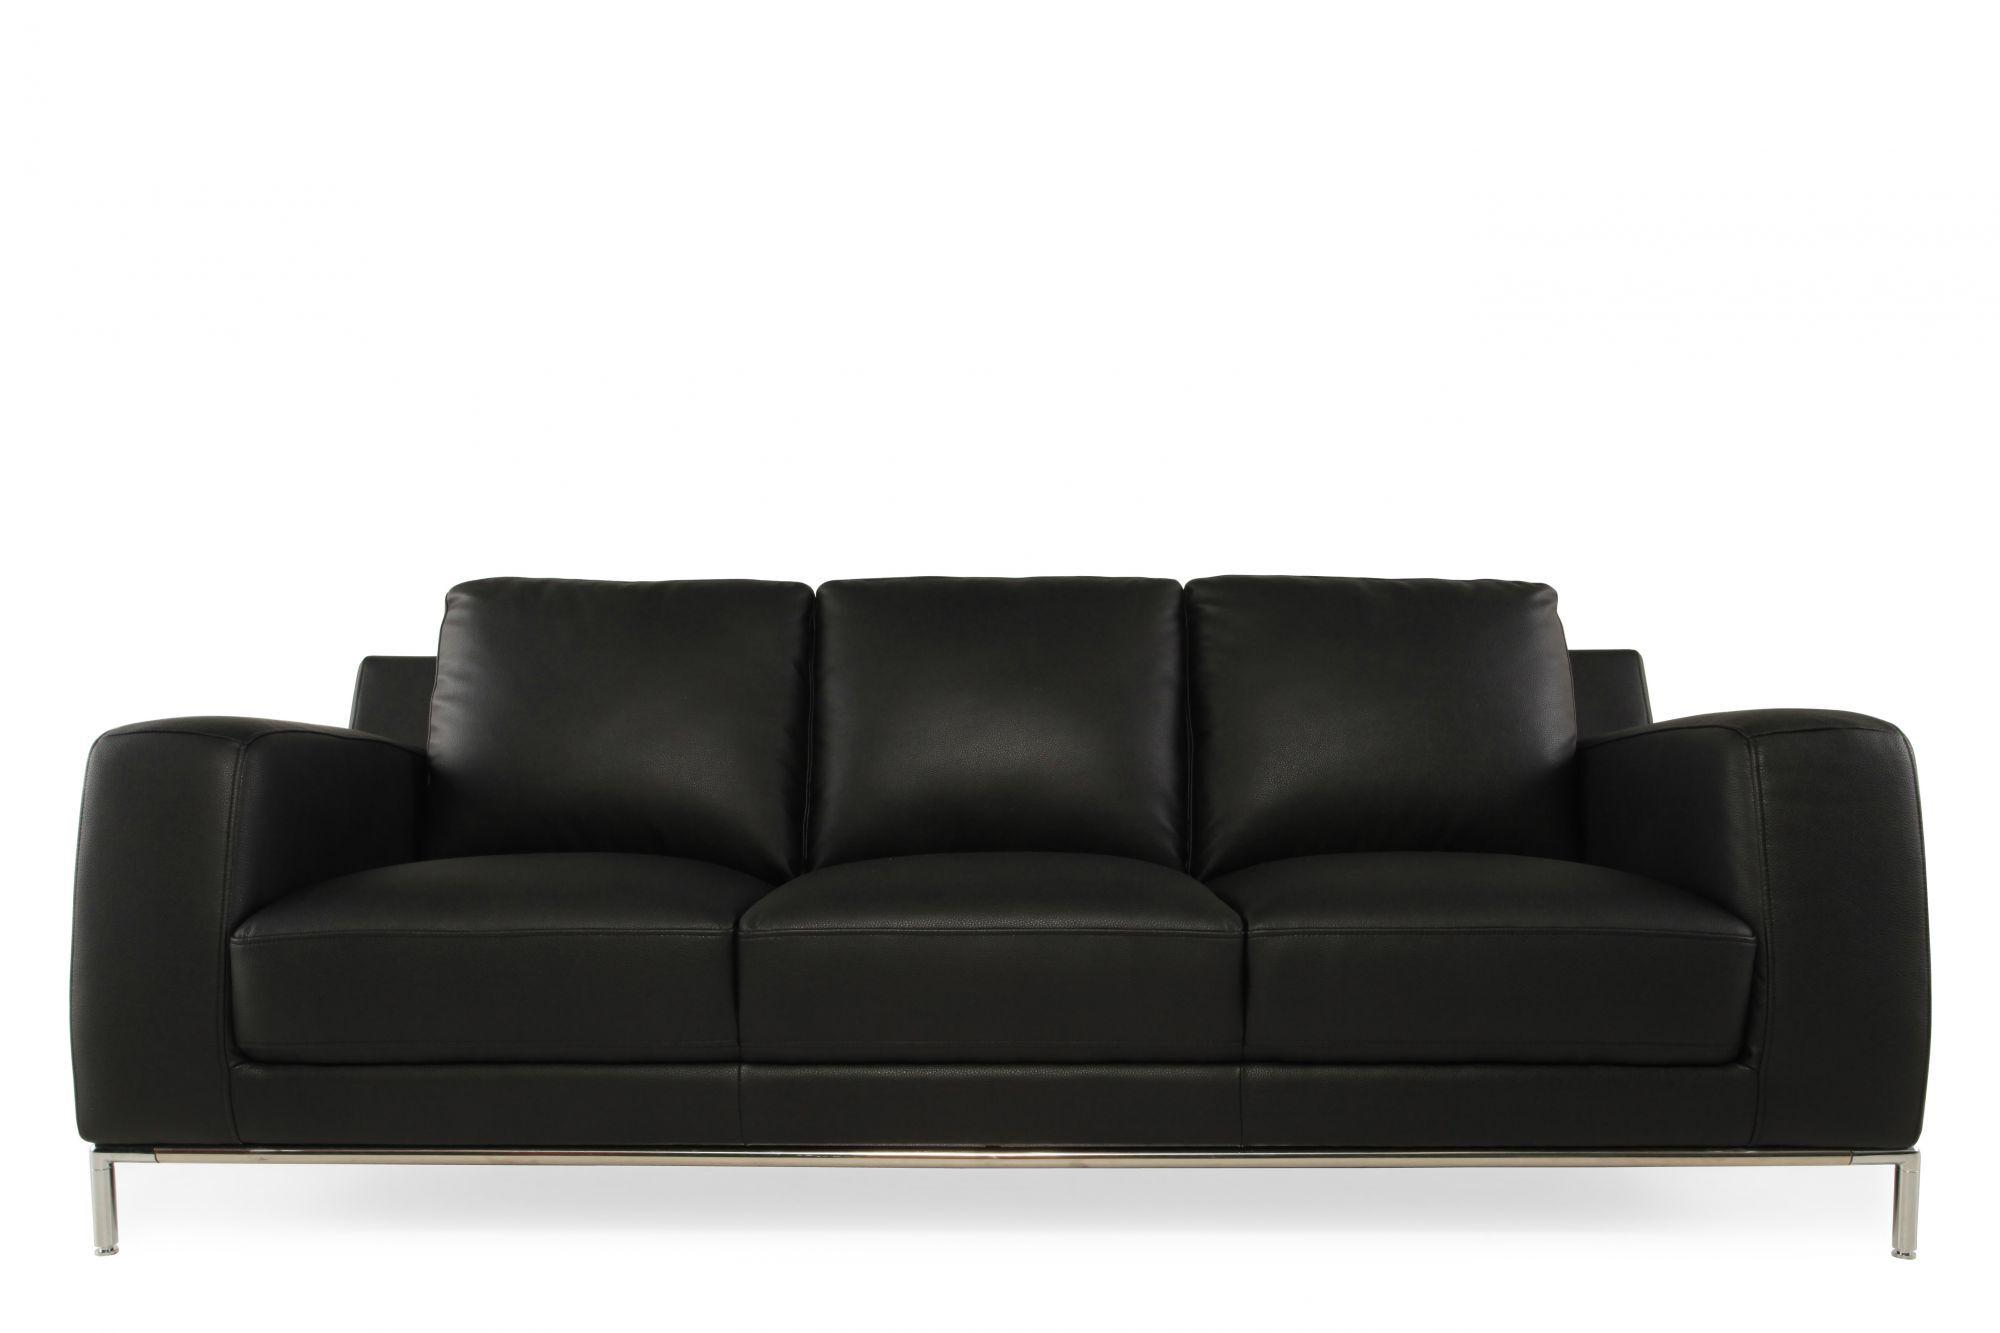 track arm sofa slipcover nz boulevard black mathis brothers furniture